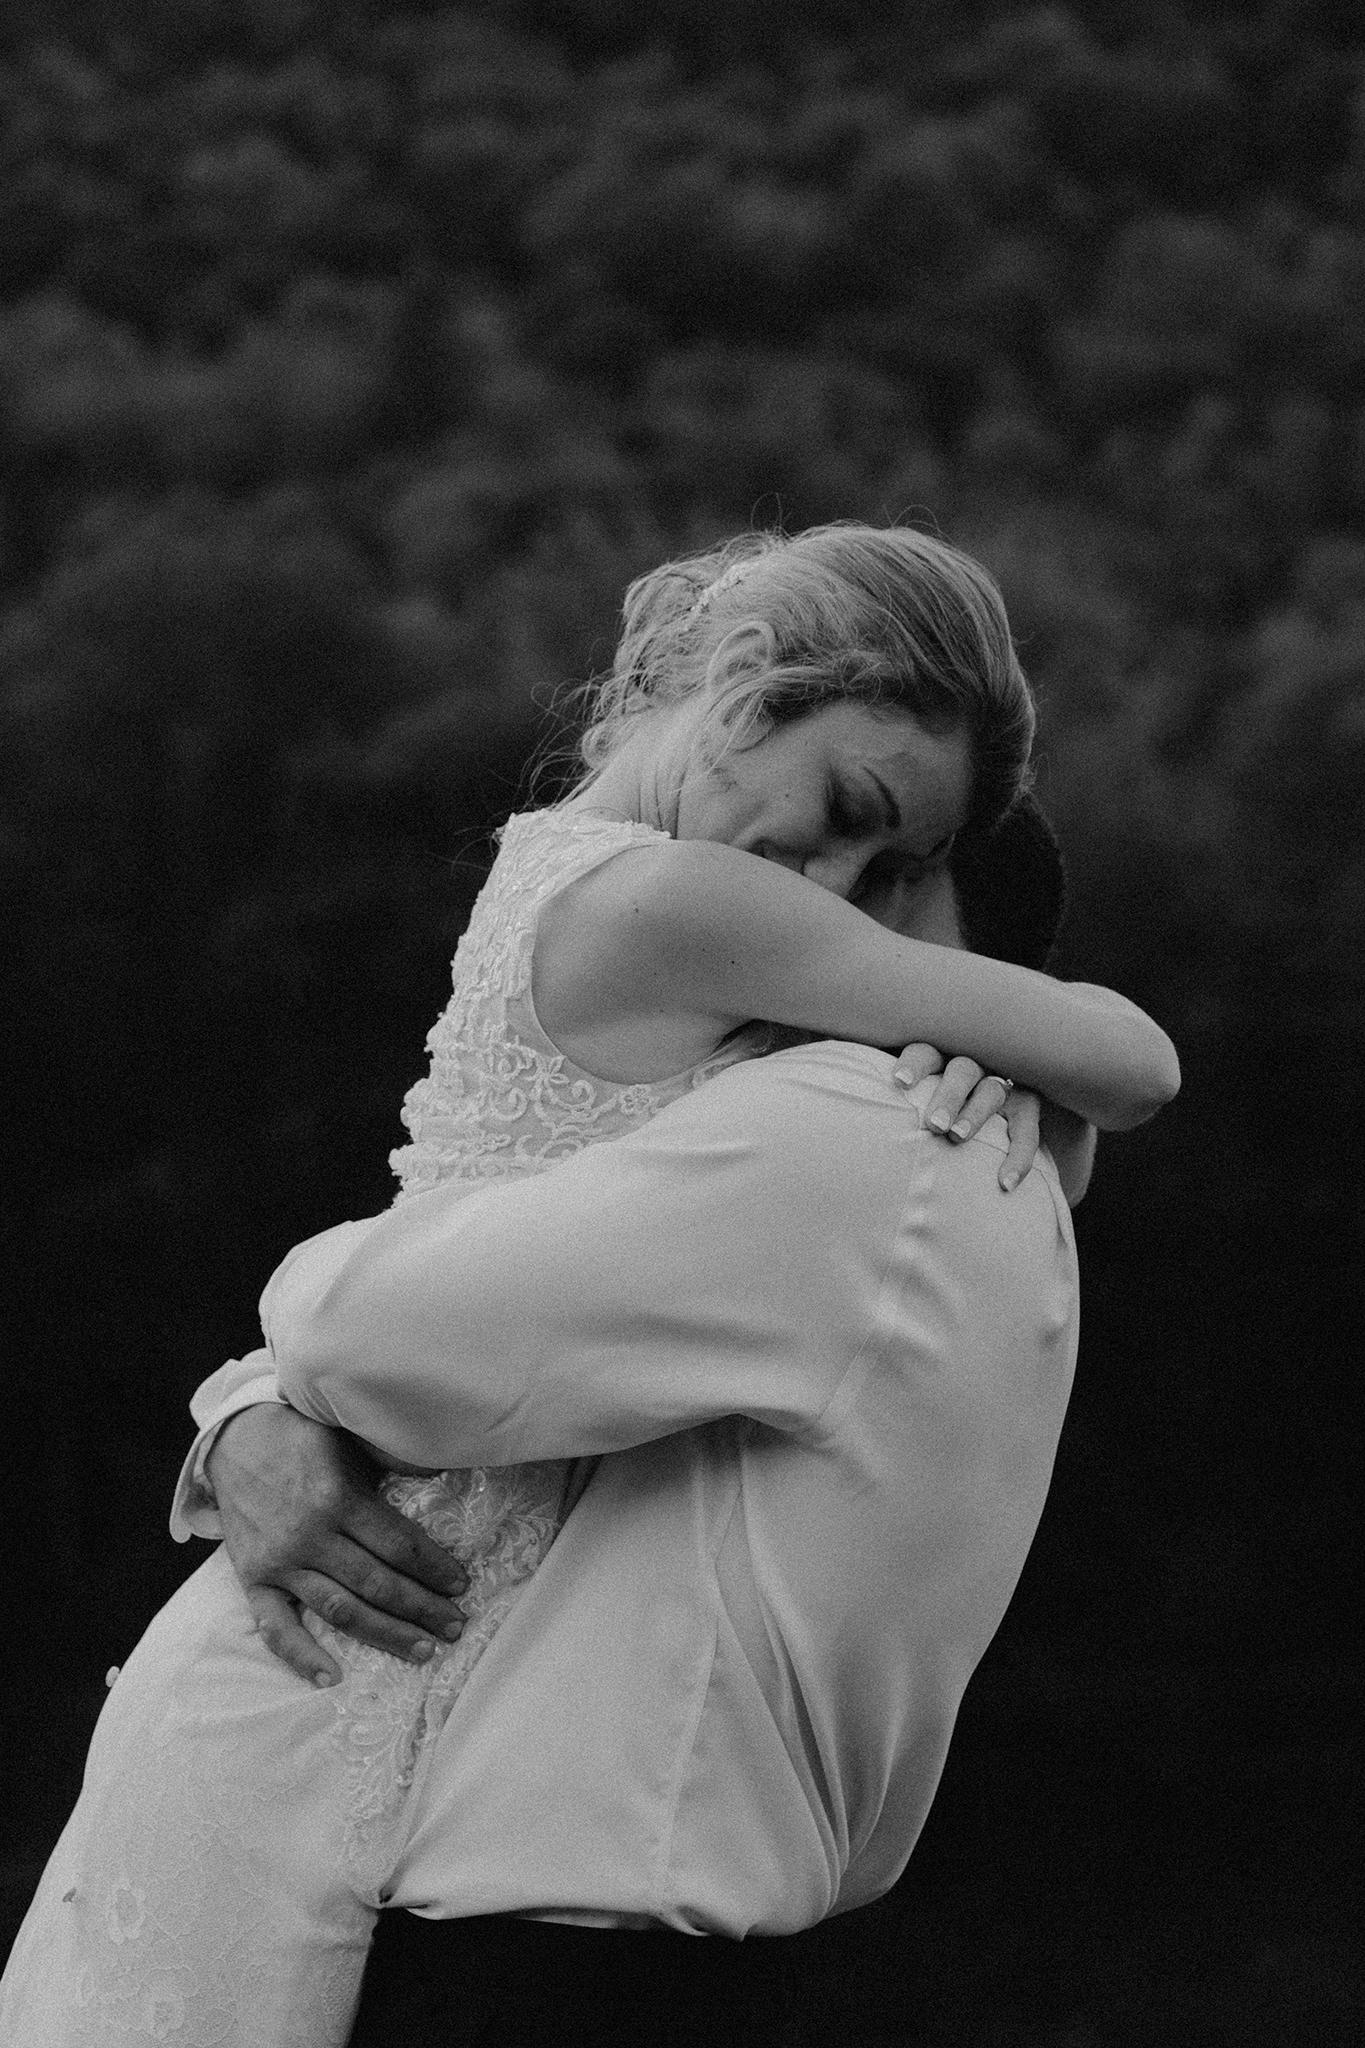 vermont-wedding-photographer-outdoor-farm-wedding-75.jpg